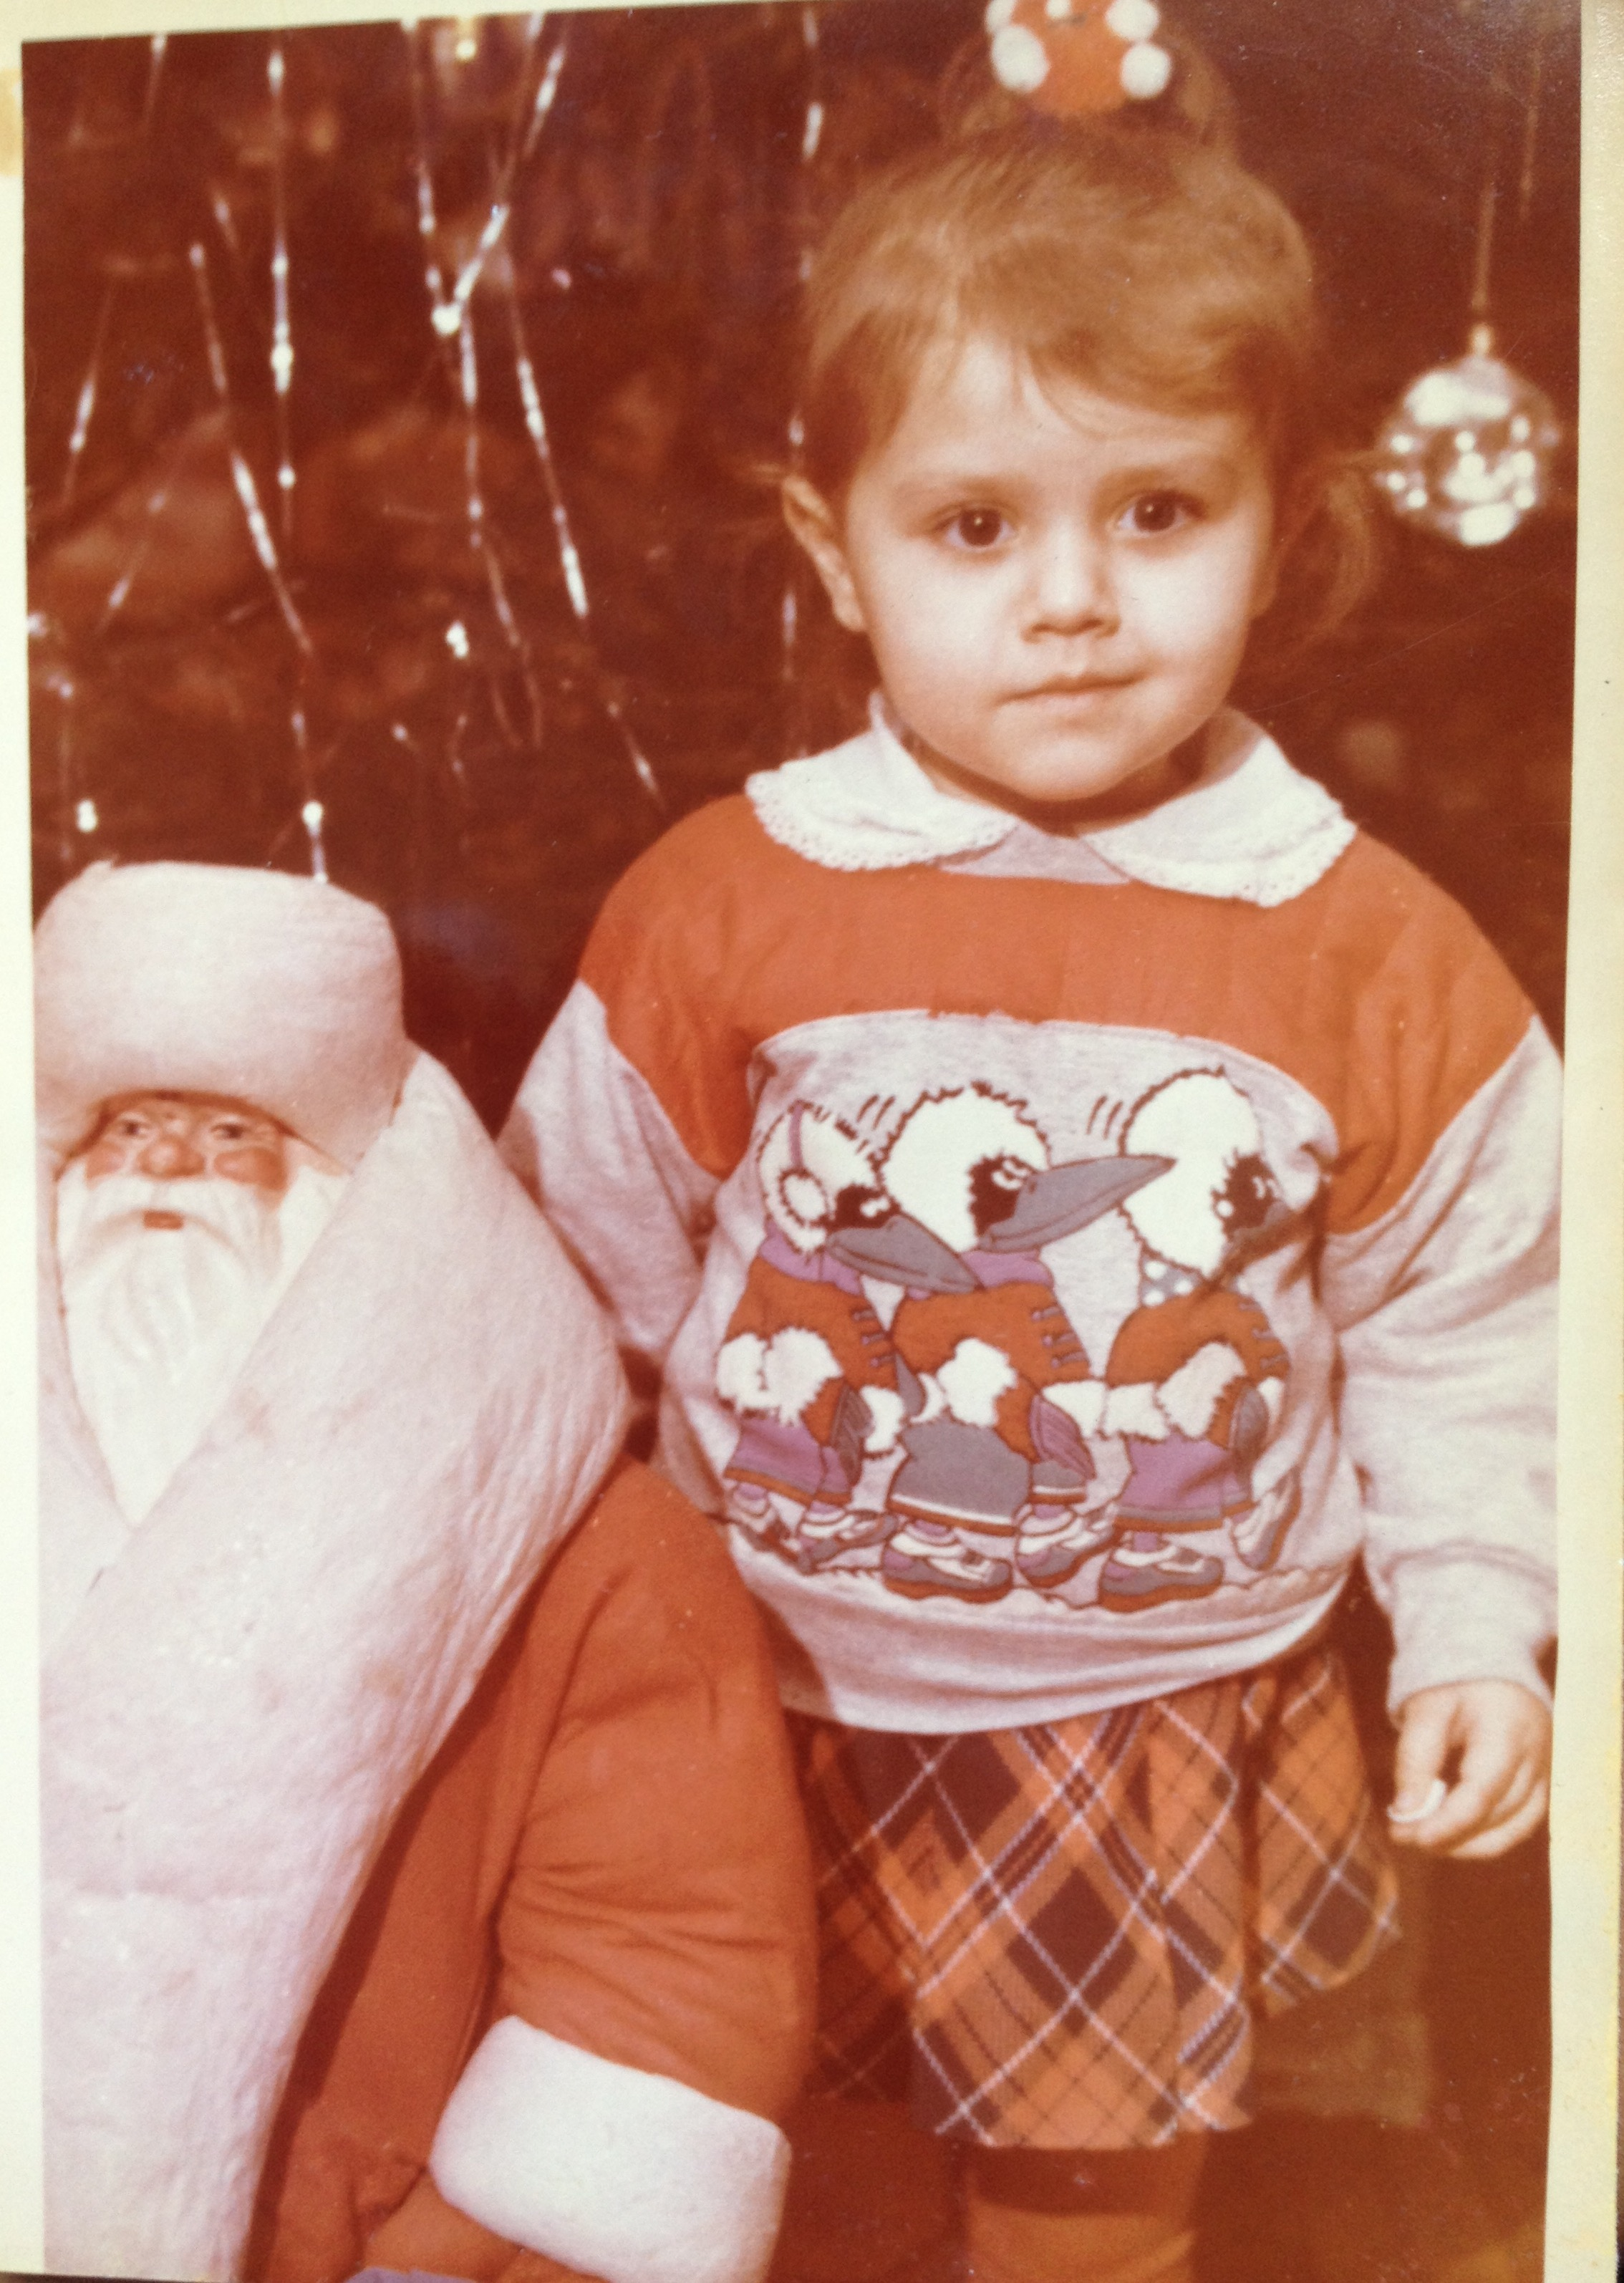 Masha Steinberg, 1993, מינסק. אני בחגיגות נובי גוד בגן.